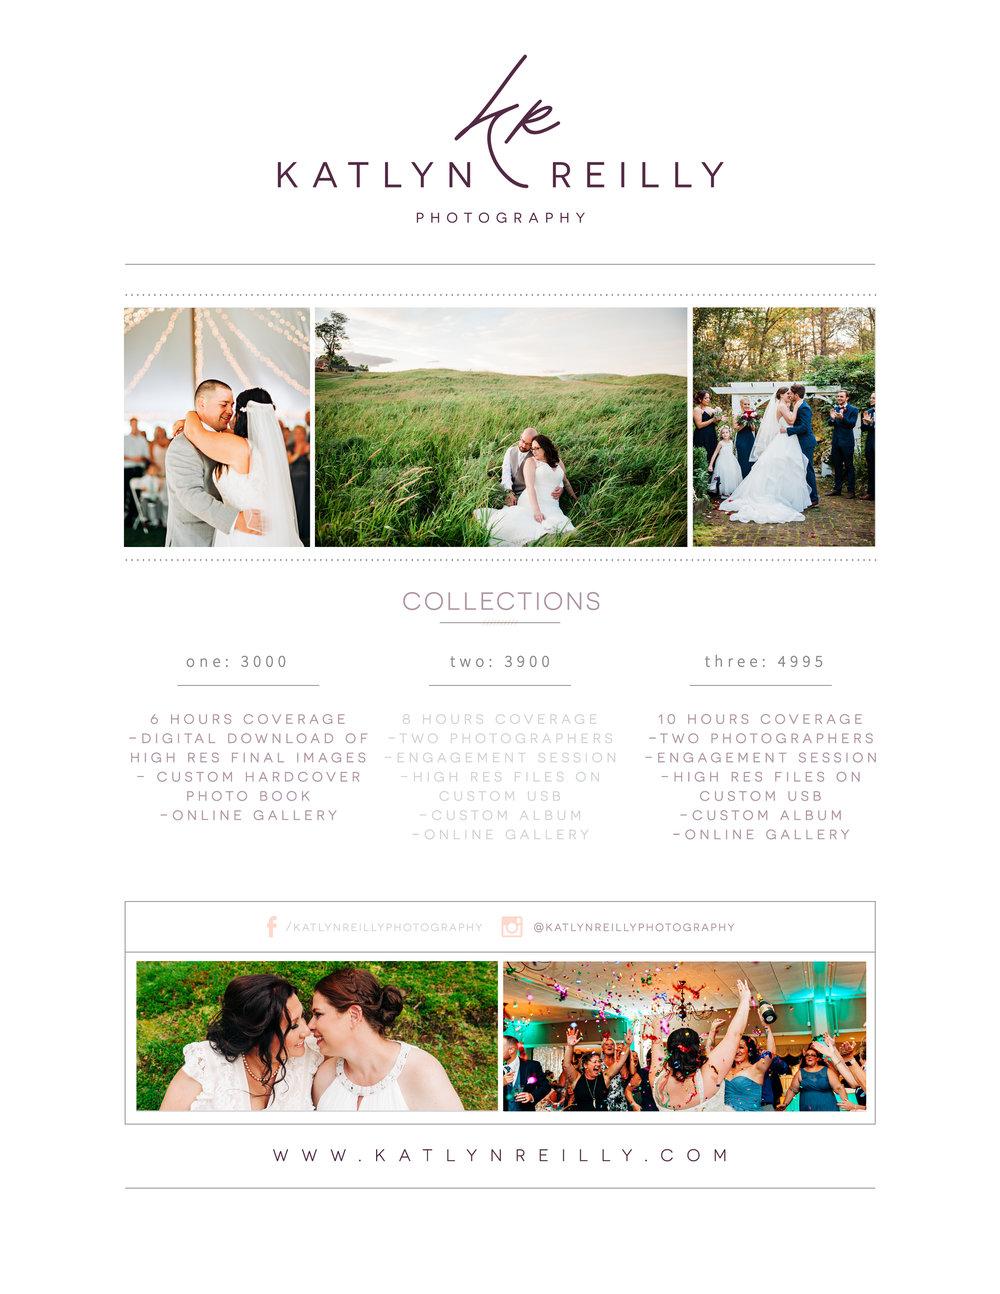 KatlynReillyPhotographyPricing